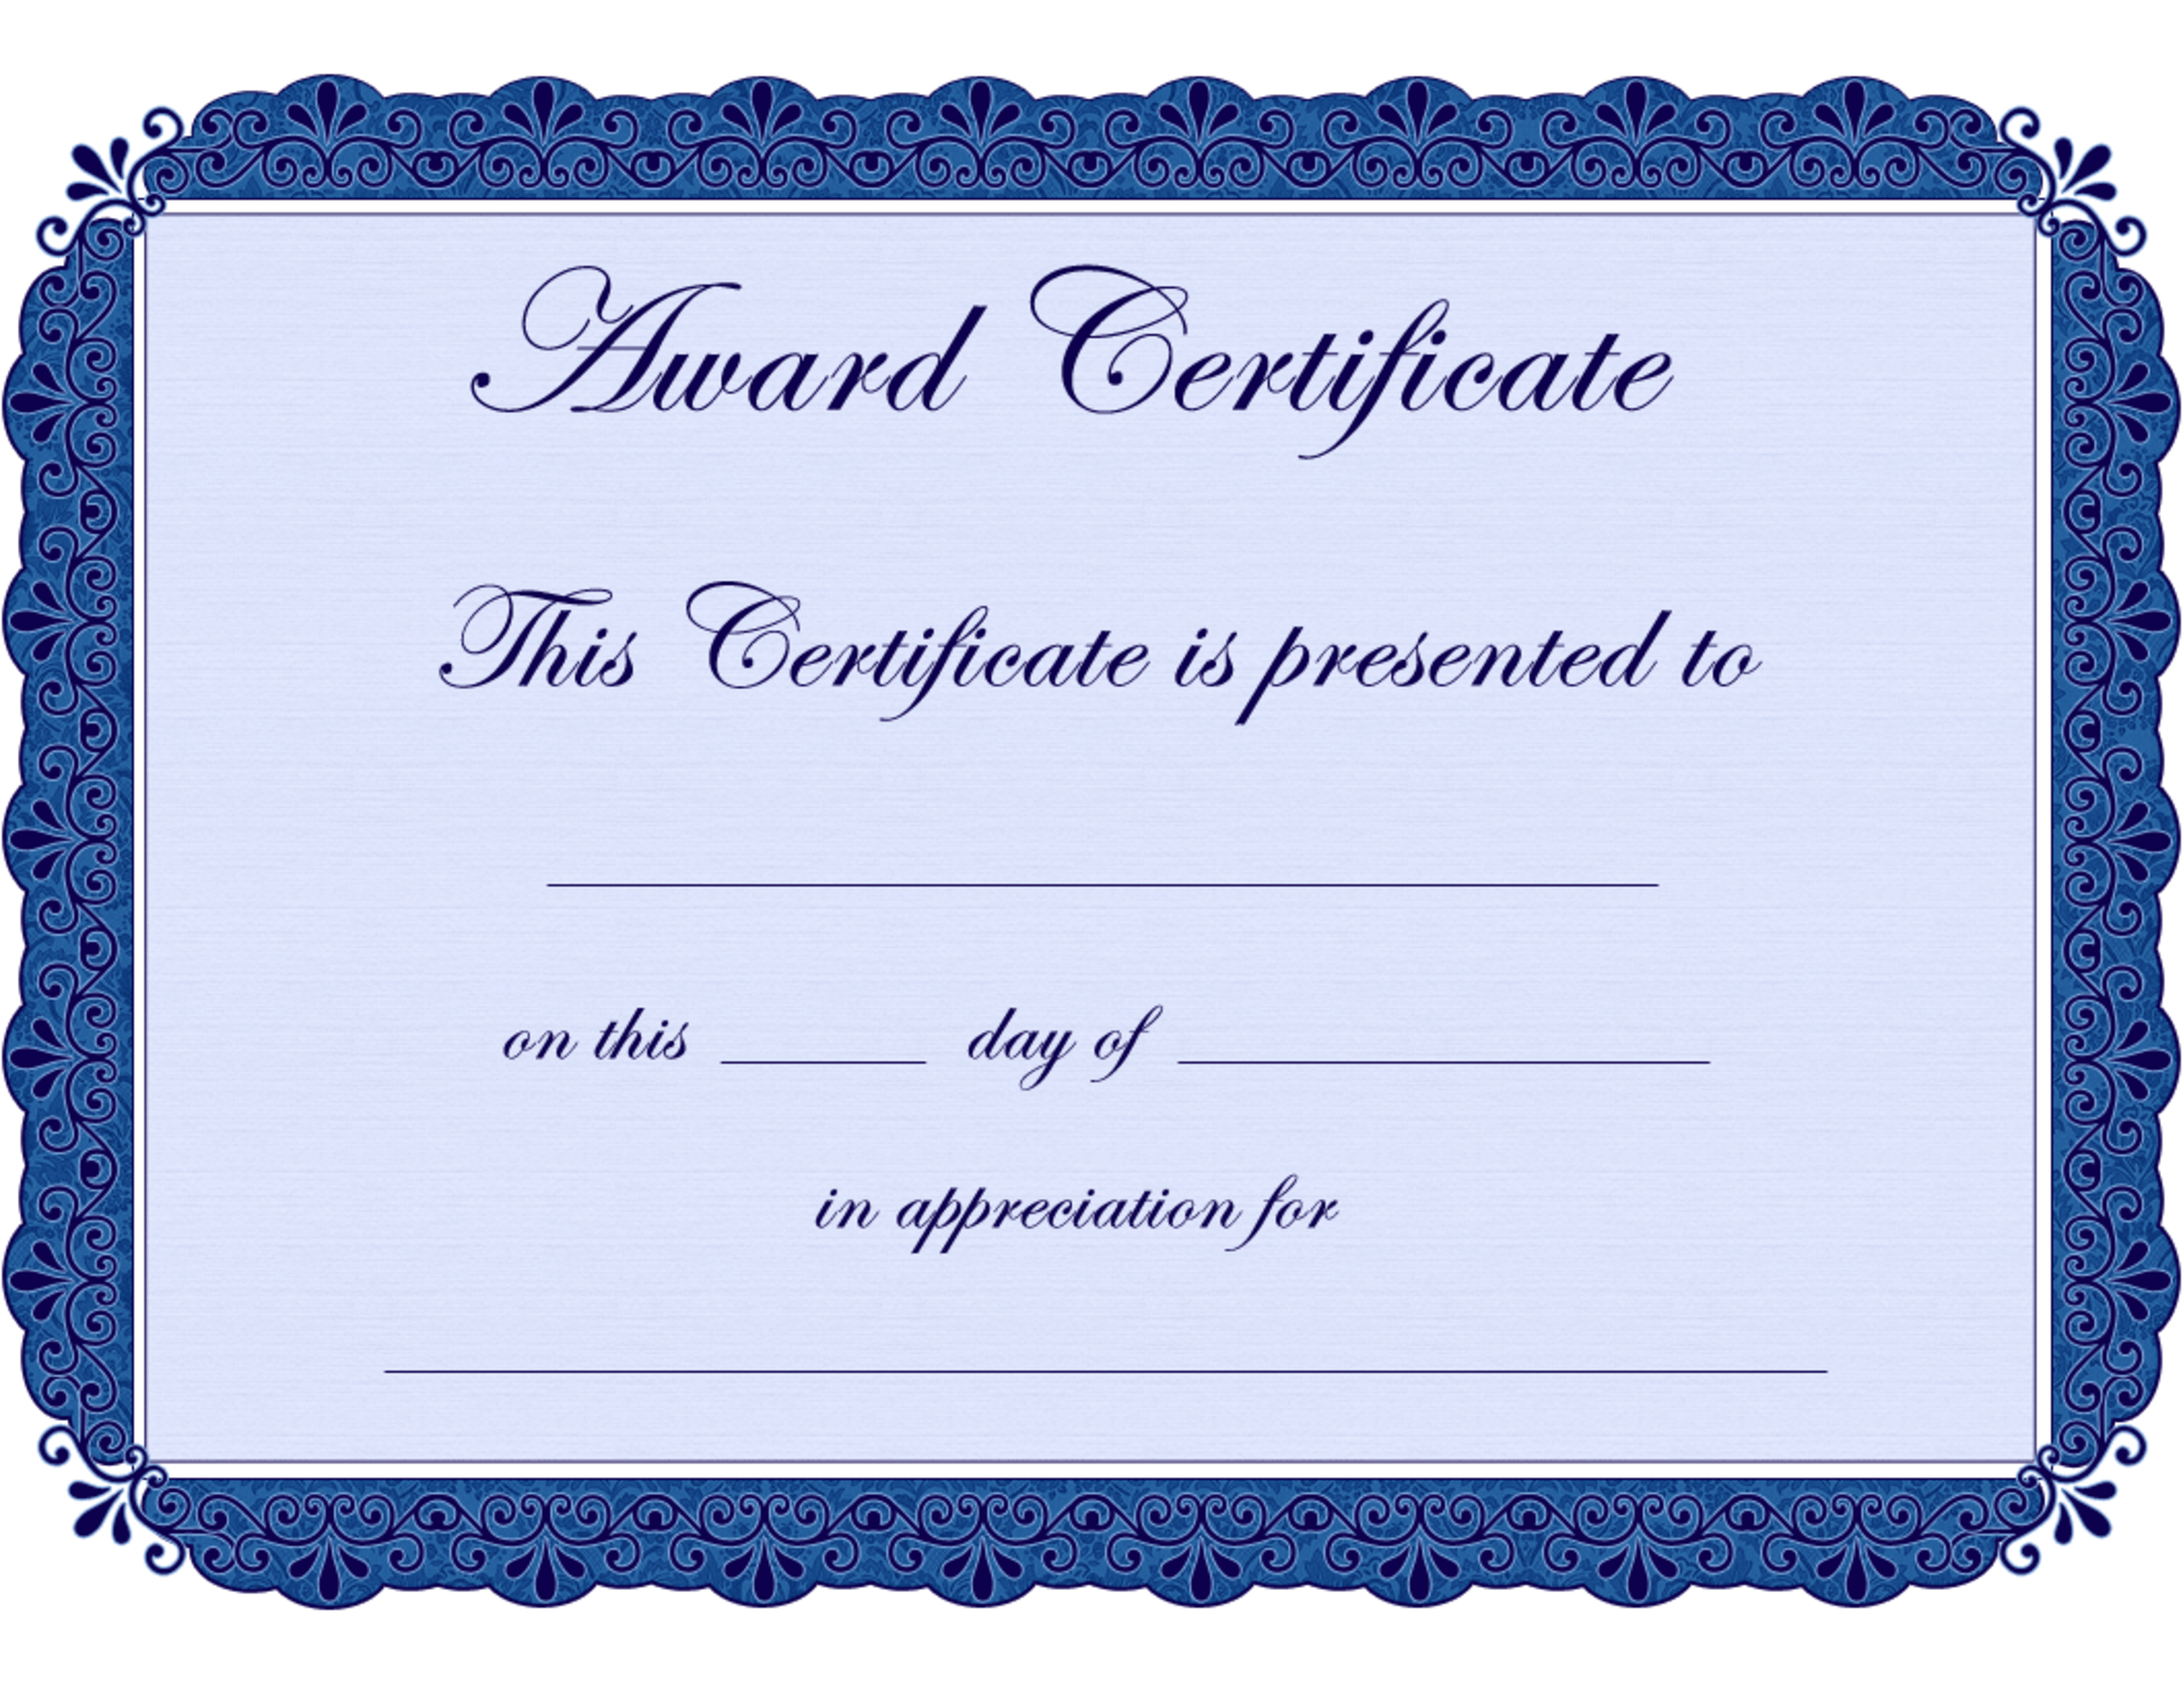 Free Printable Award Certificate Borders |  Award Certificate - Free Printable Wrestling Certificates